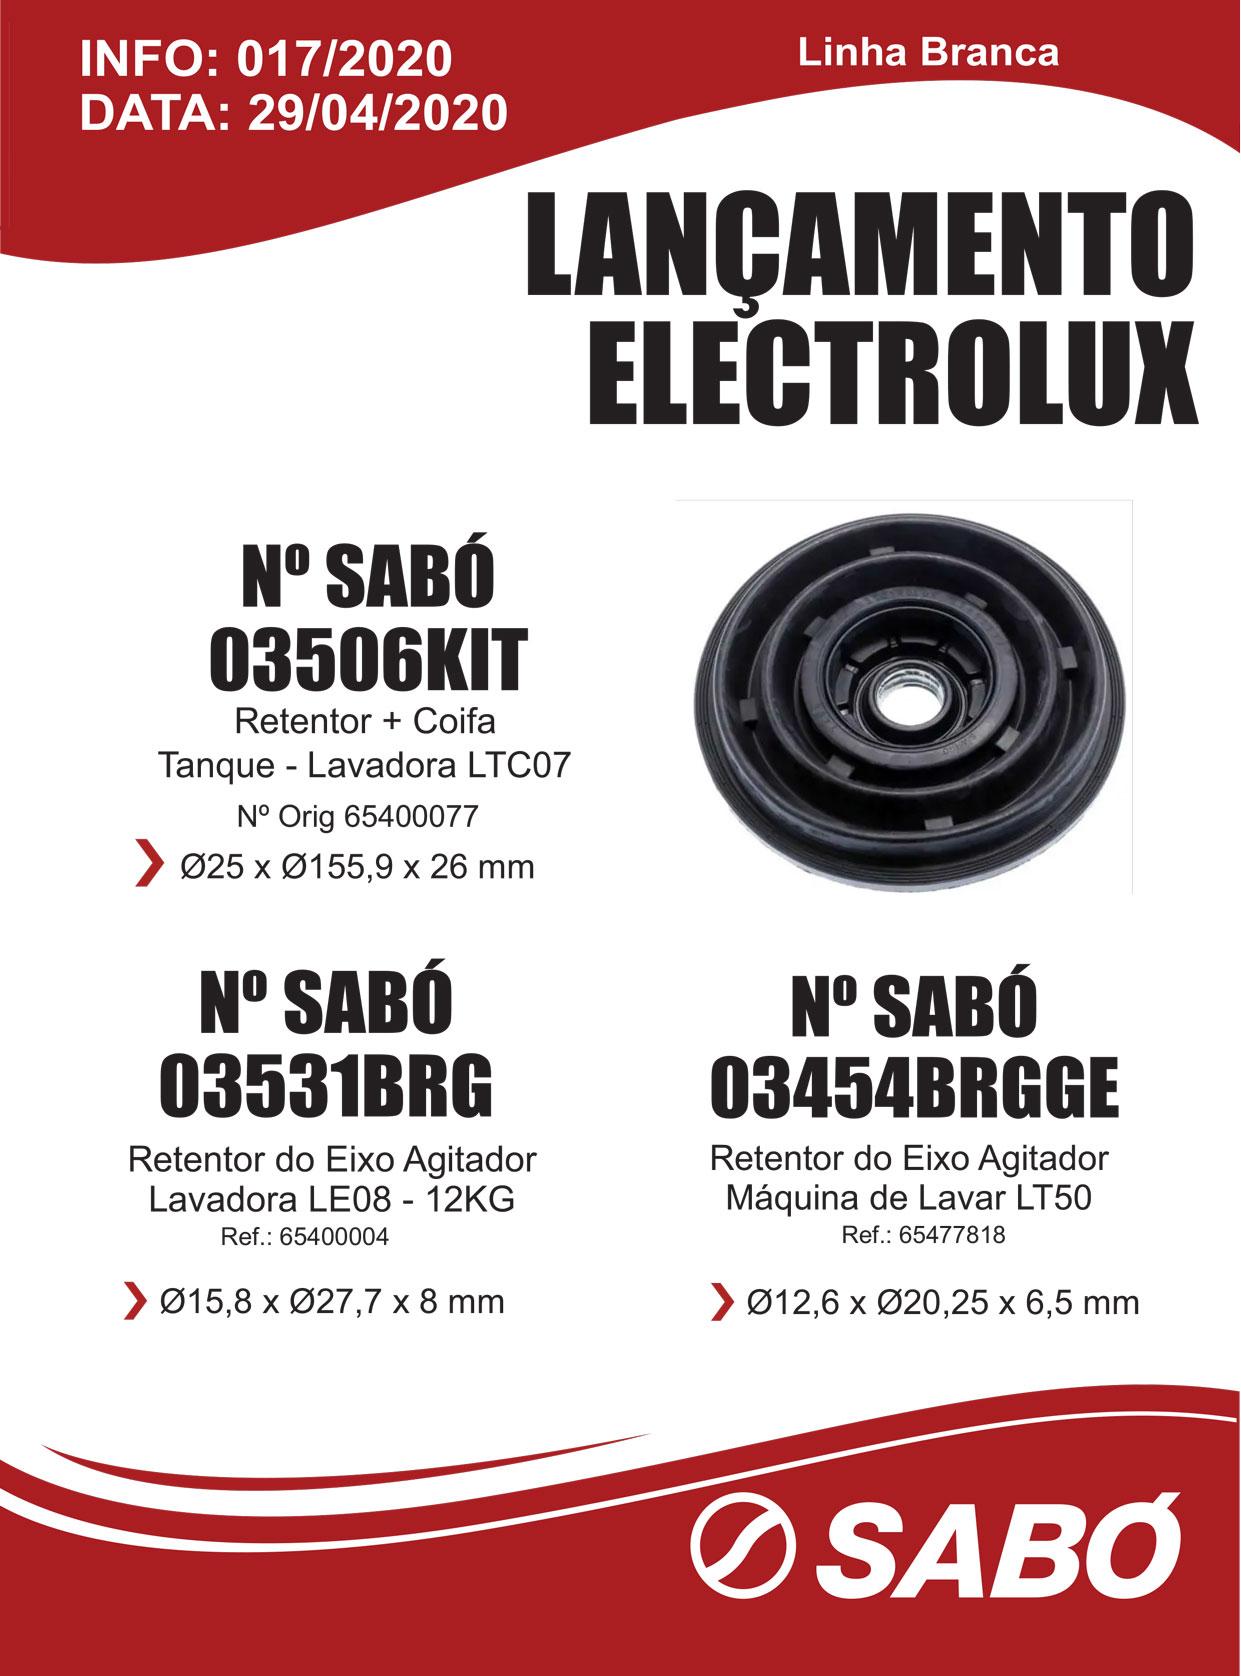 Info-017-Electrolux